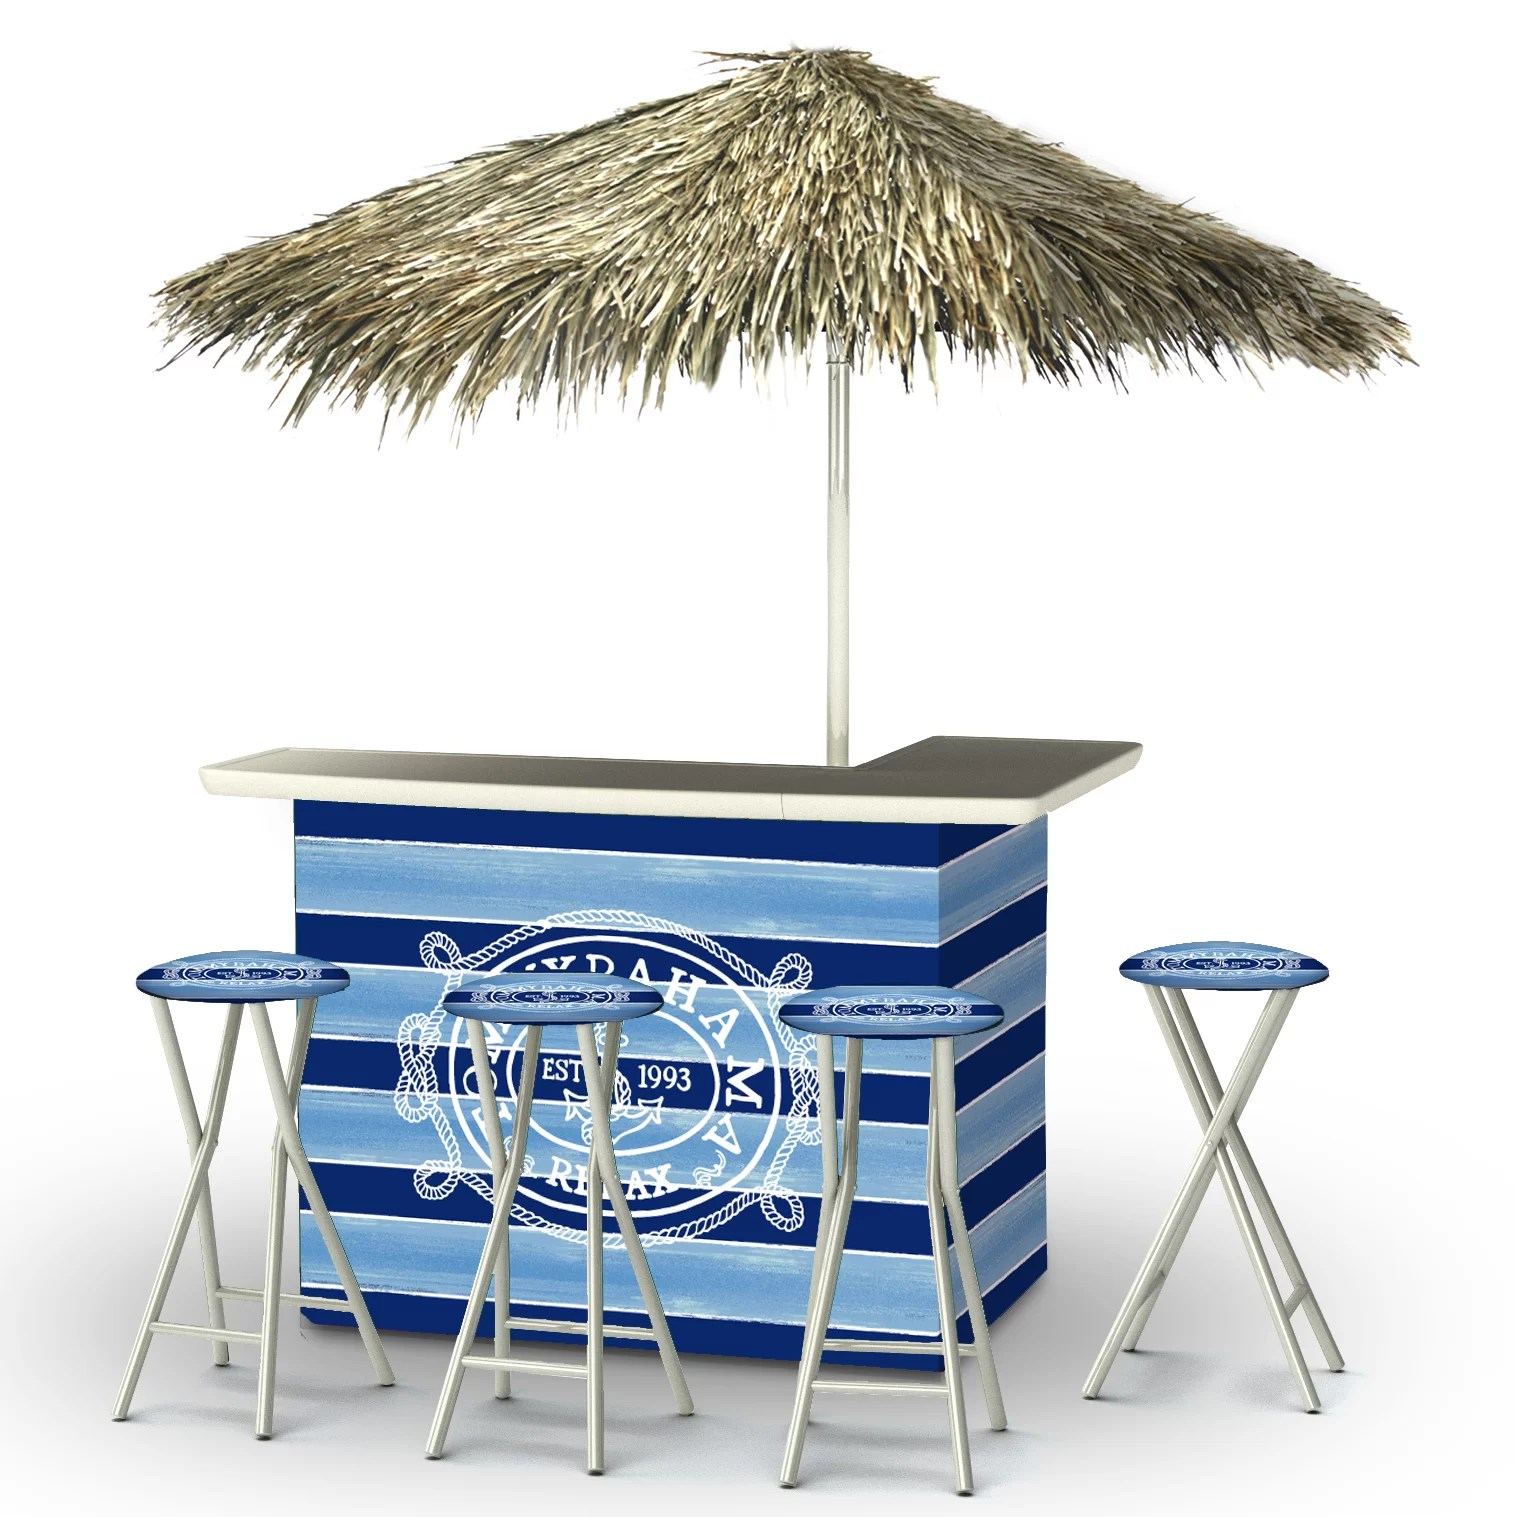 Best of Times Tommy Bahama Tiki Bar Set | Wayfair on Backyard Tiki Bar For Sale id=62531